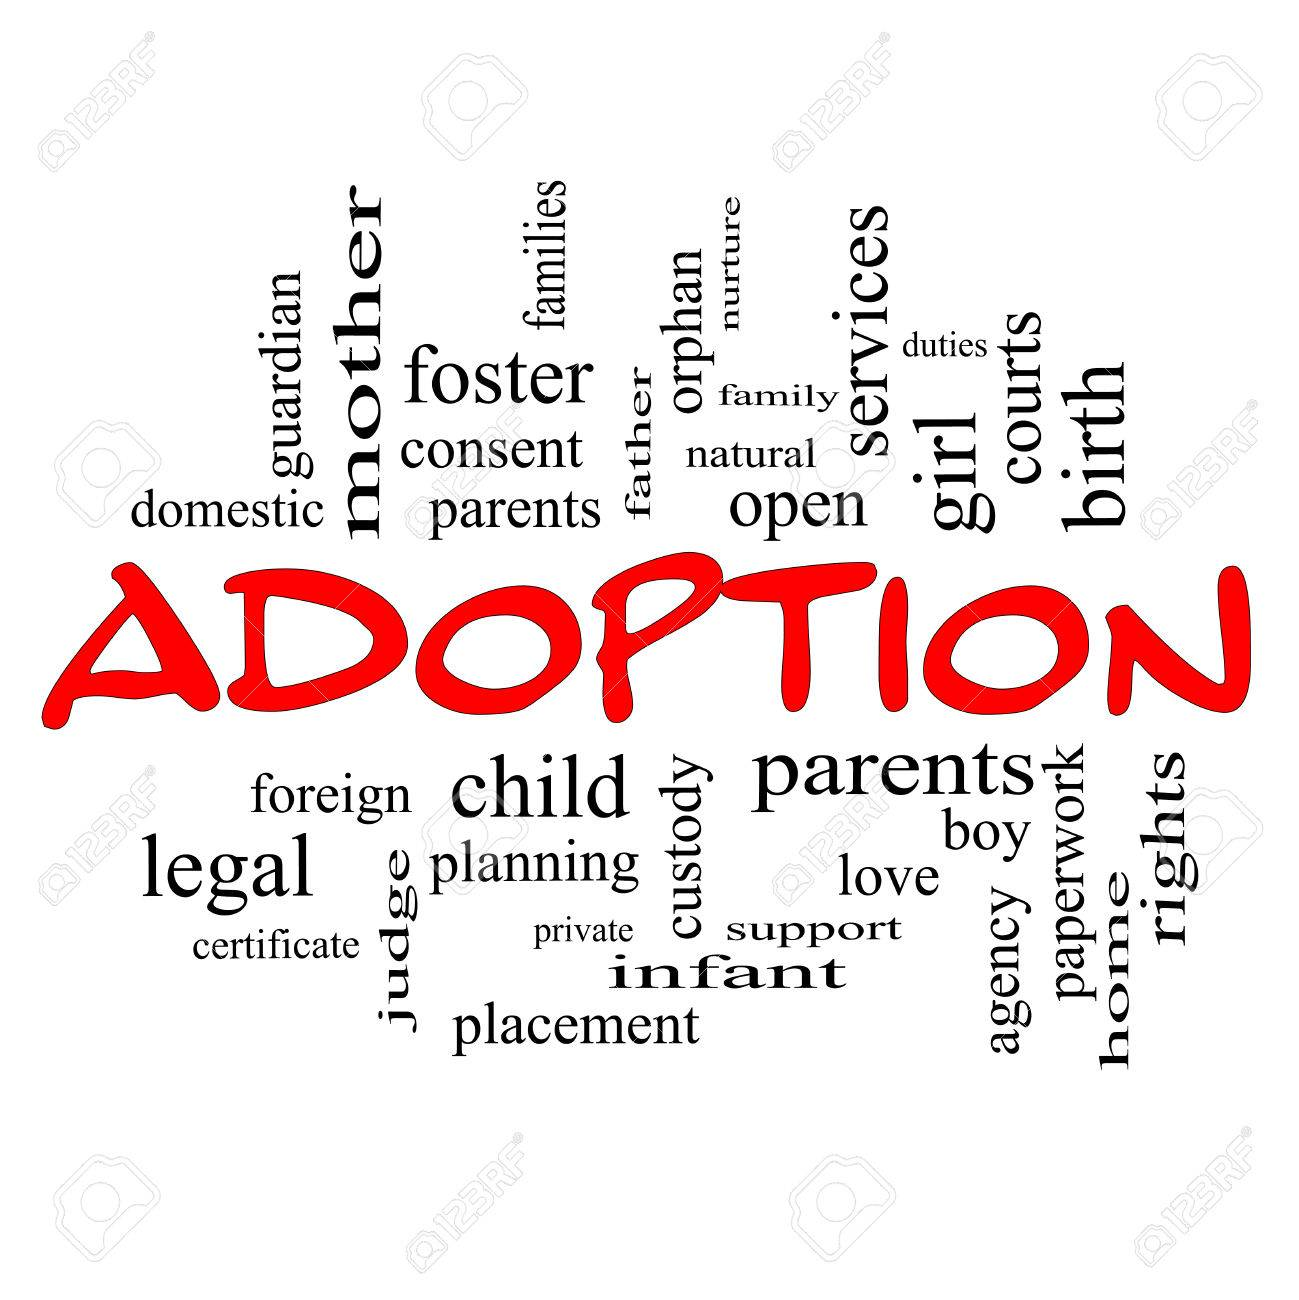 Adoption in Ghana